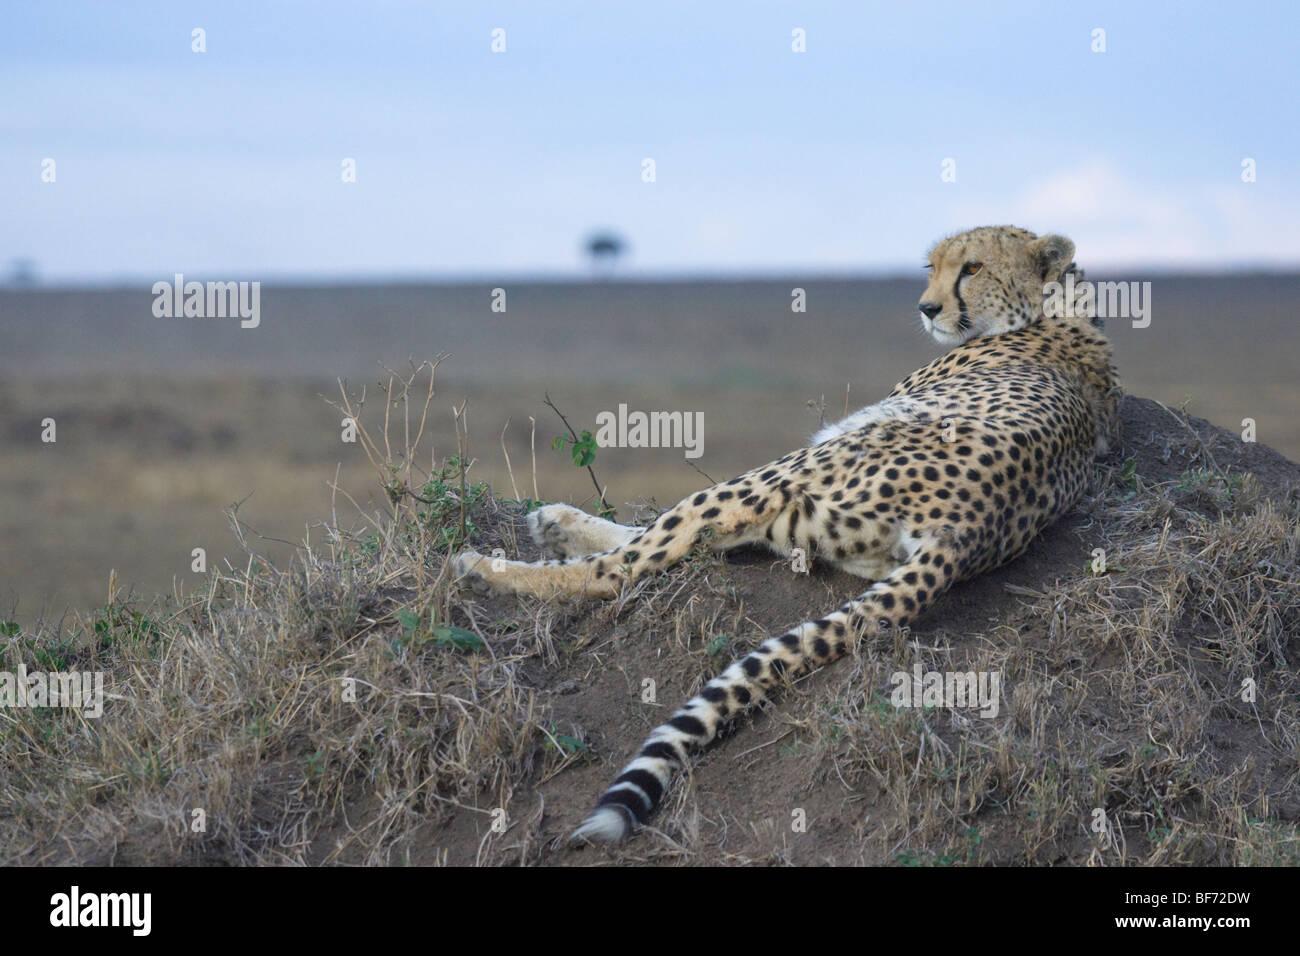 Female Cheetah, Acinonyx jubatus, laying on top of a termite mound. Masai Mara National Reserve, Kenya. - Stock Image